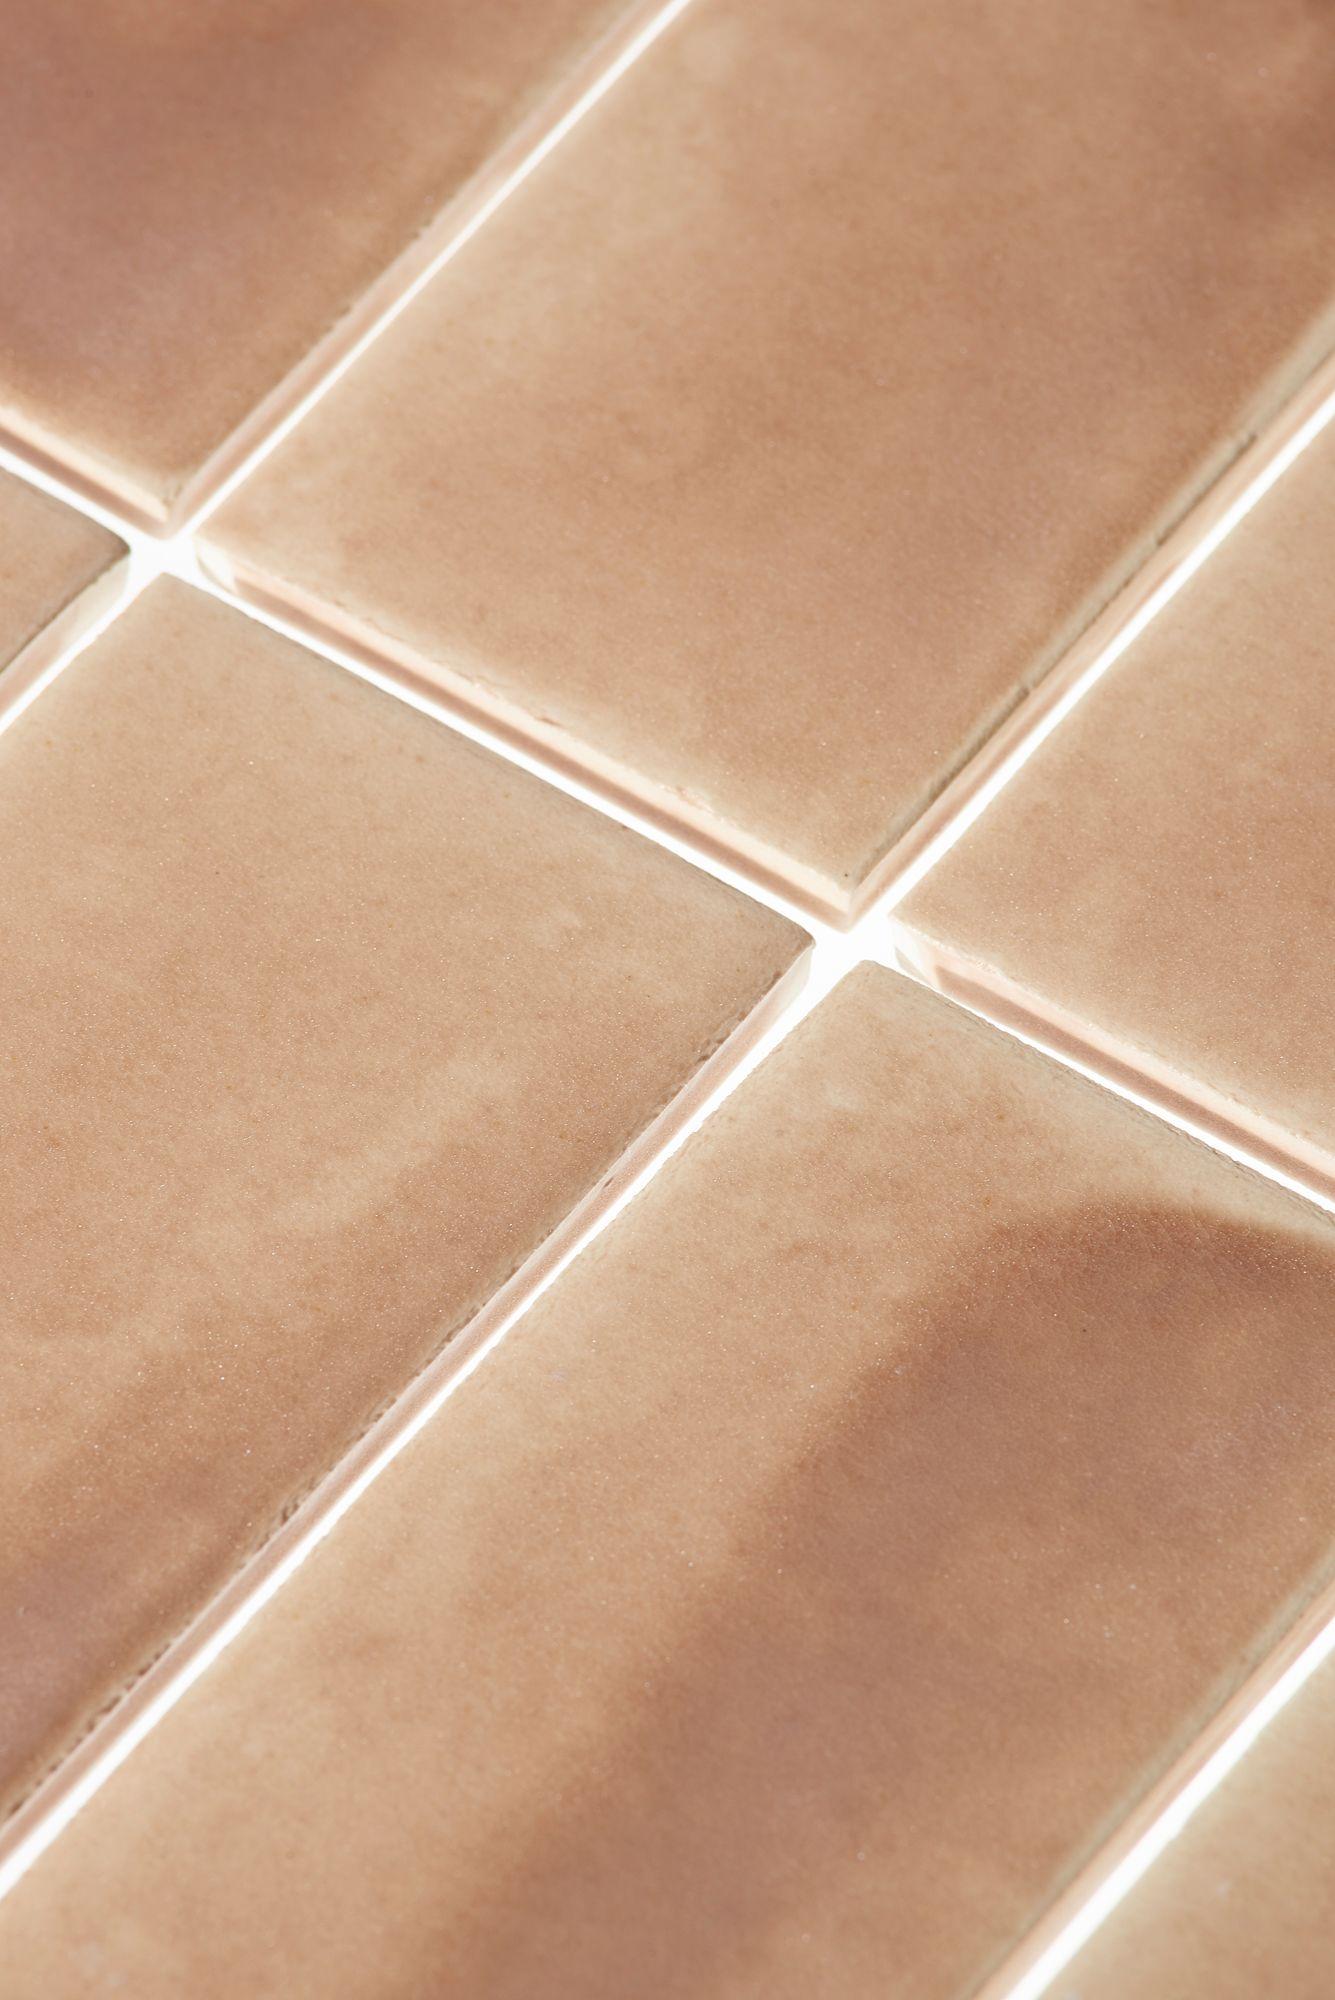 MN2SM_2 Manganese Waste Glazed Tiles